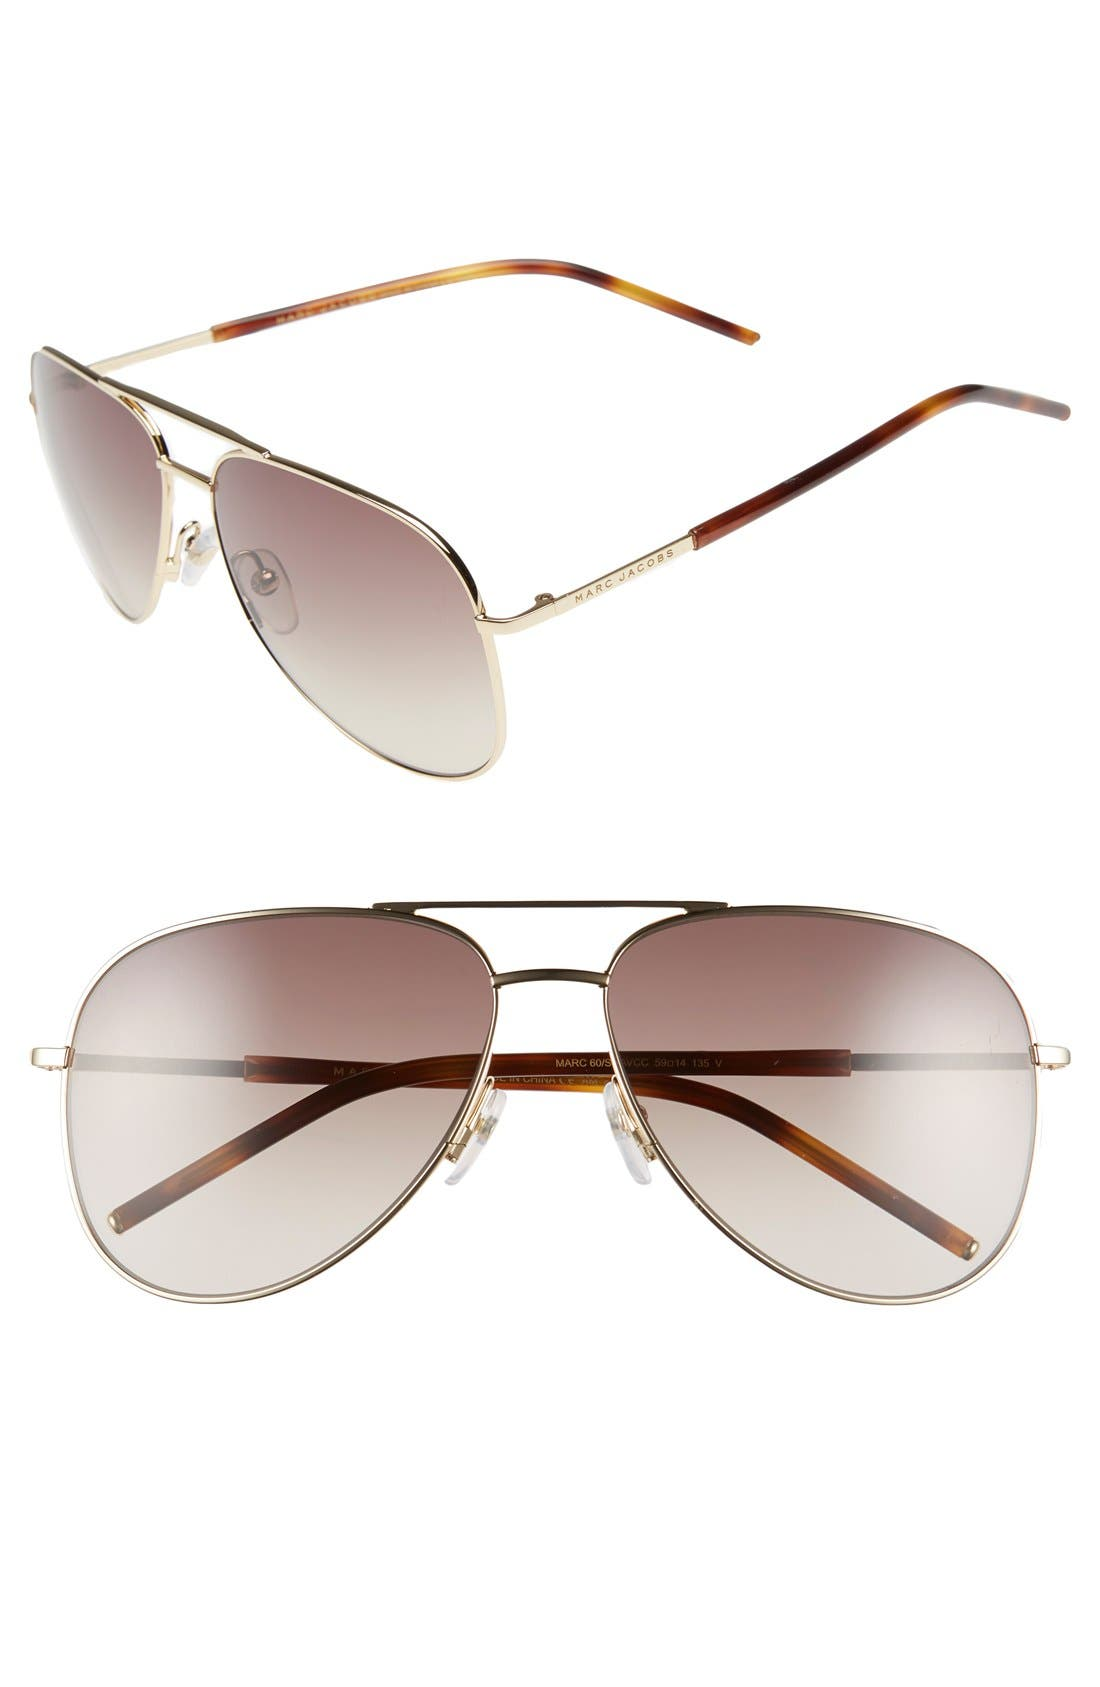 59mm Aviator Sunglasses,                             Main thumbnail 1, color,                             710